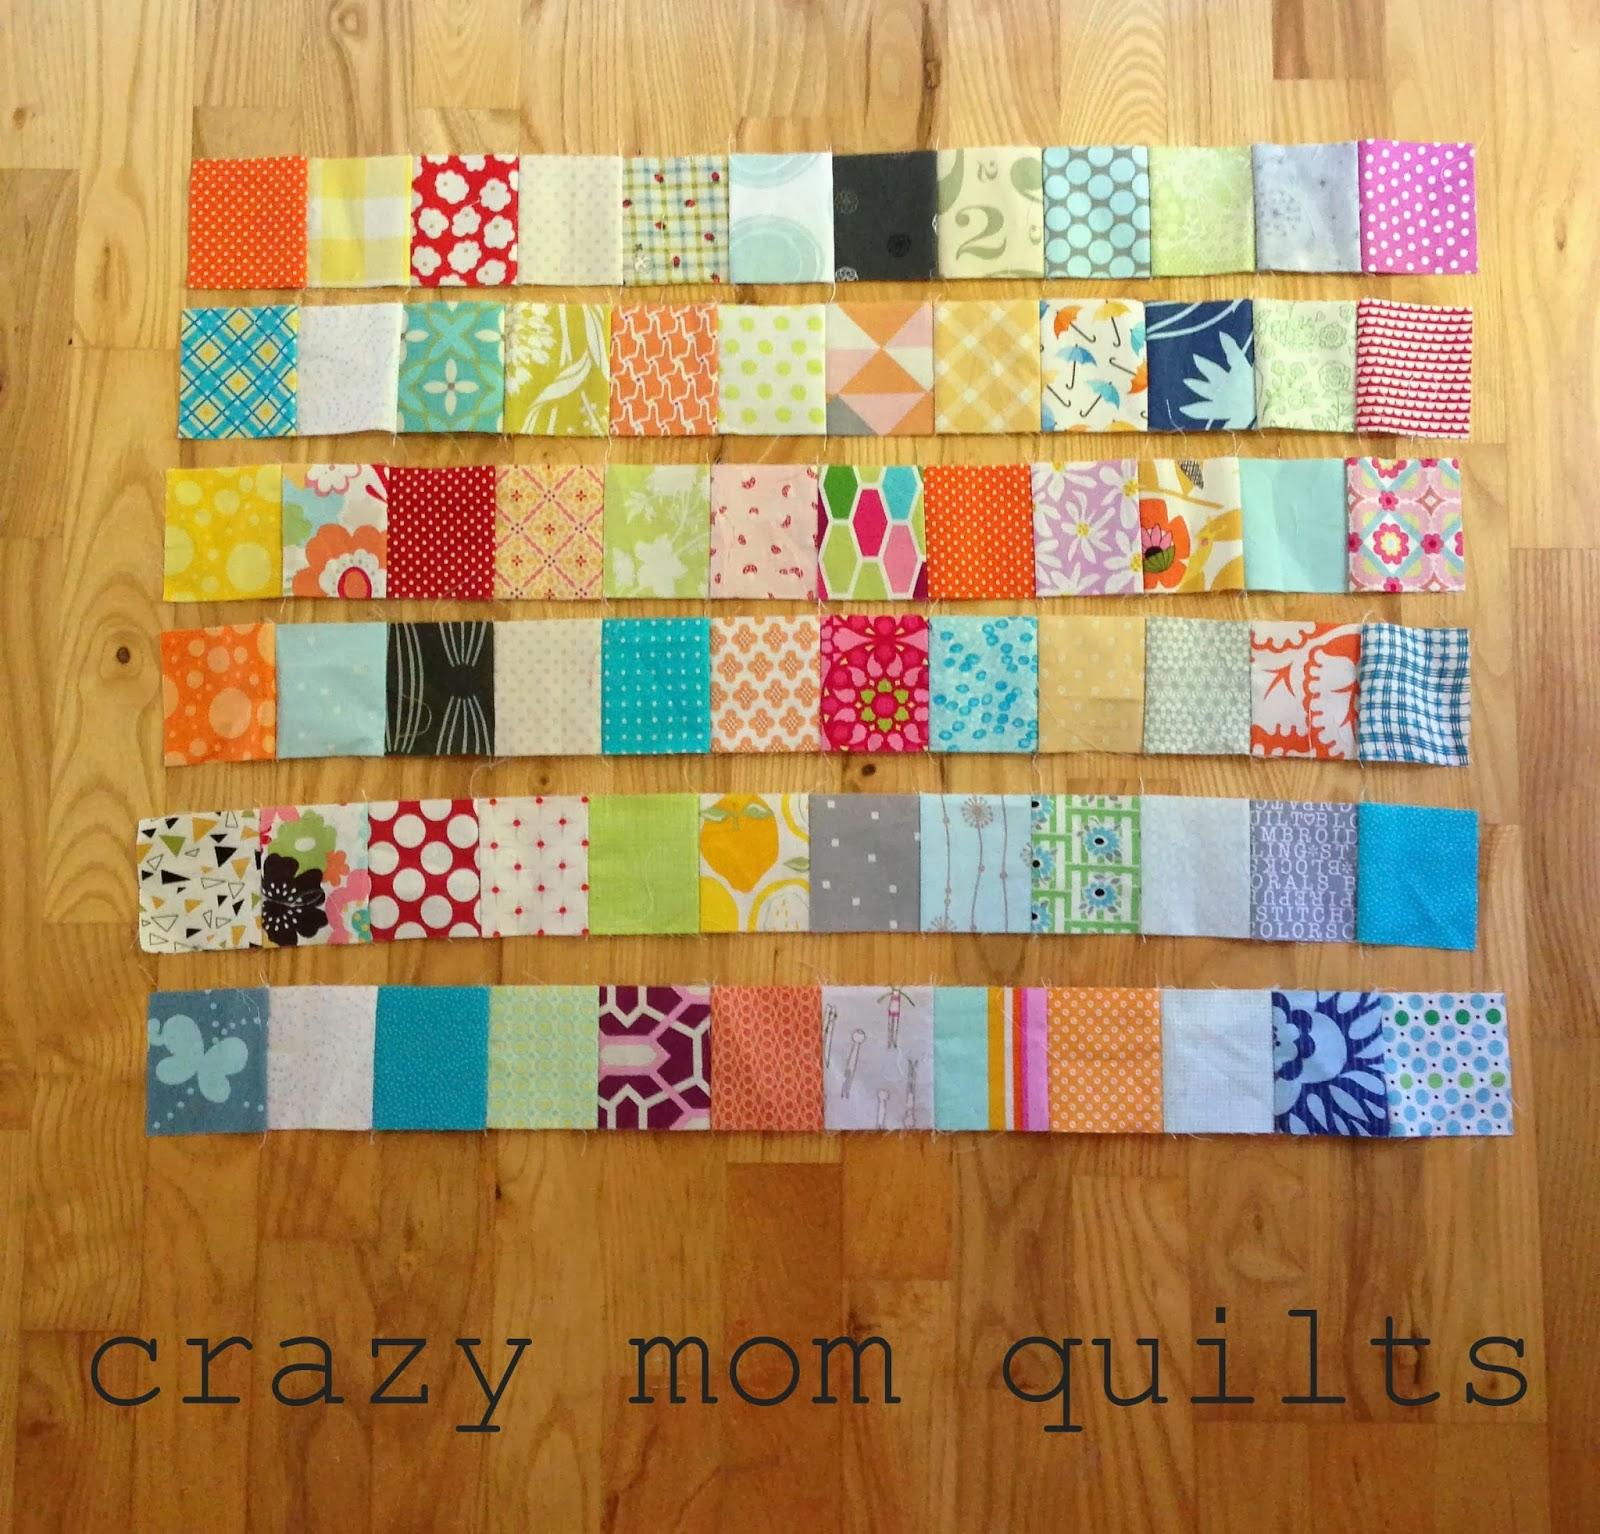 crazy mom quilts: one way to randomize patchwork : patchwork quilt squares - Adamdwight.com